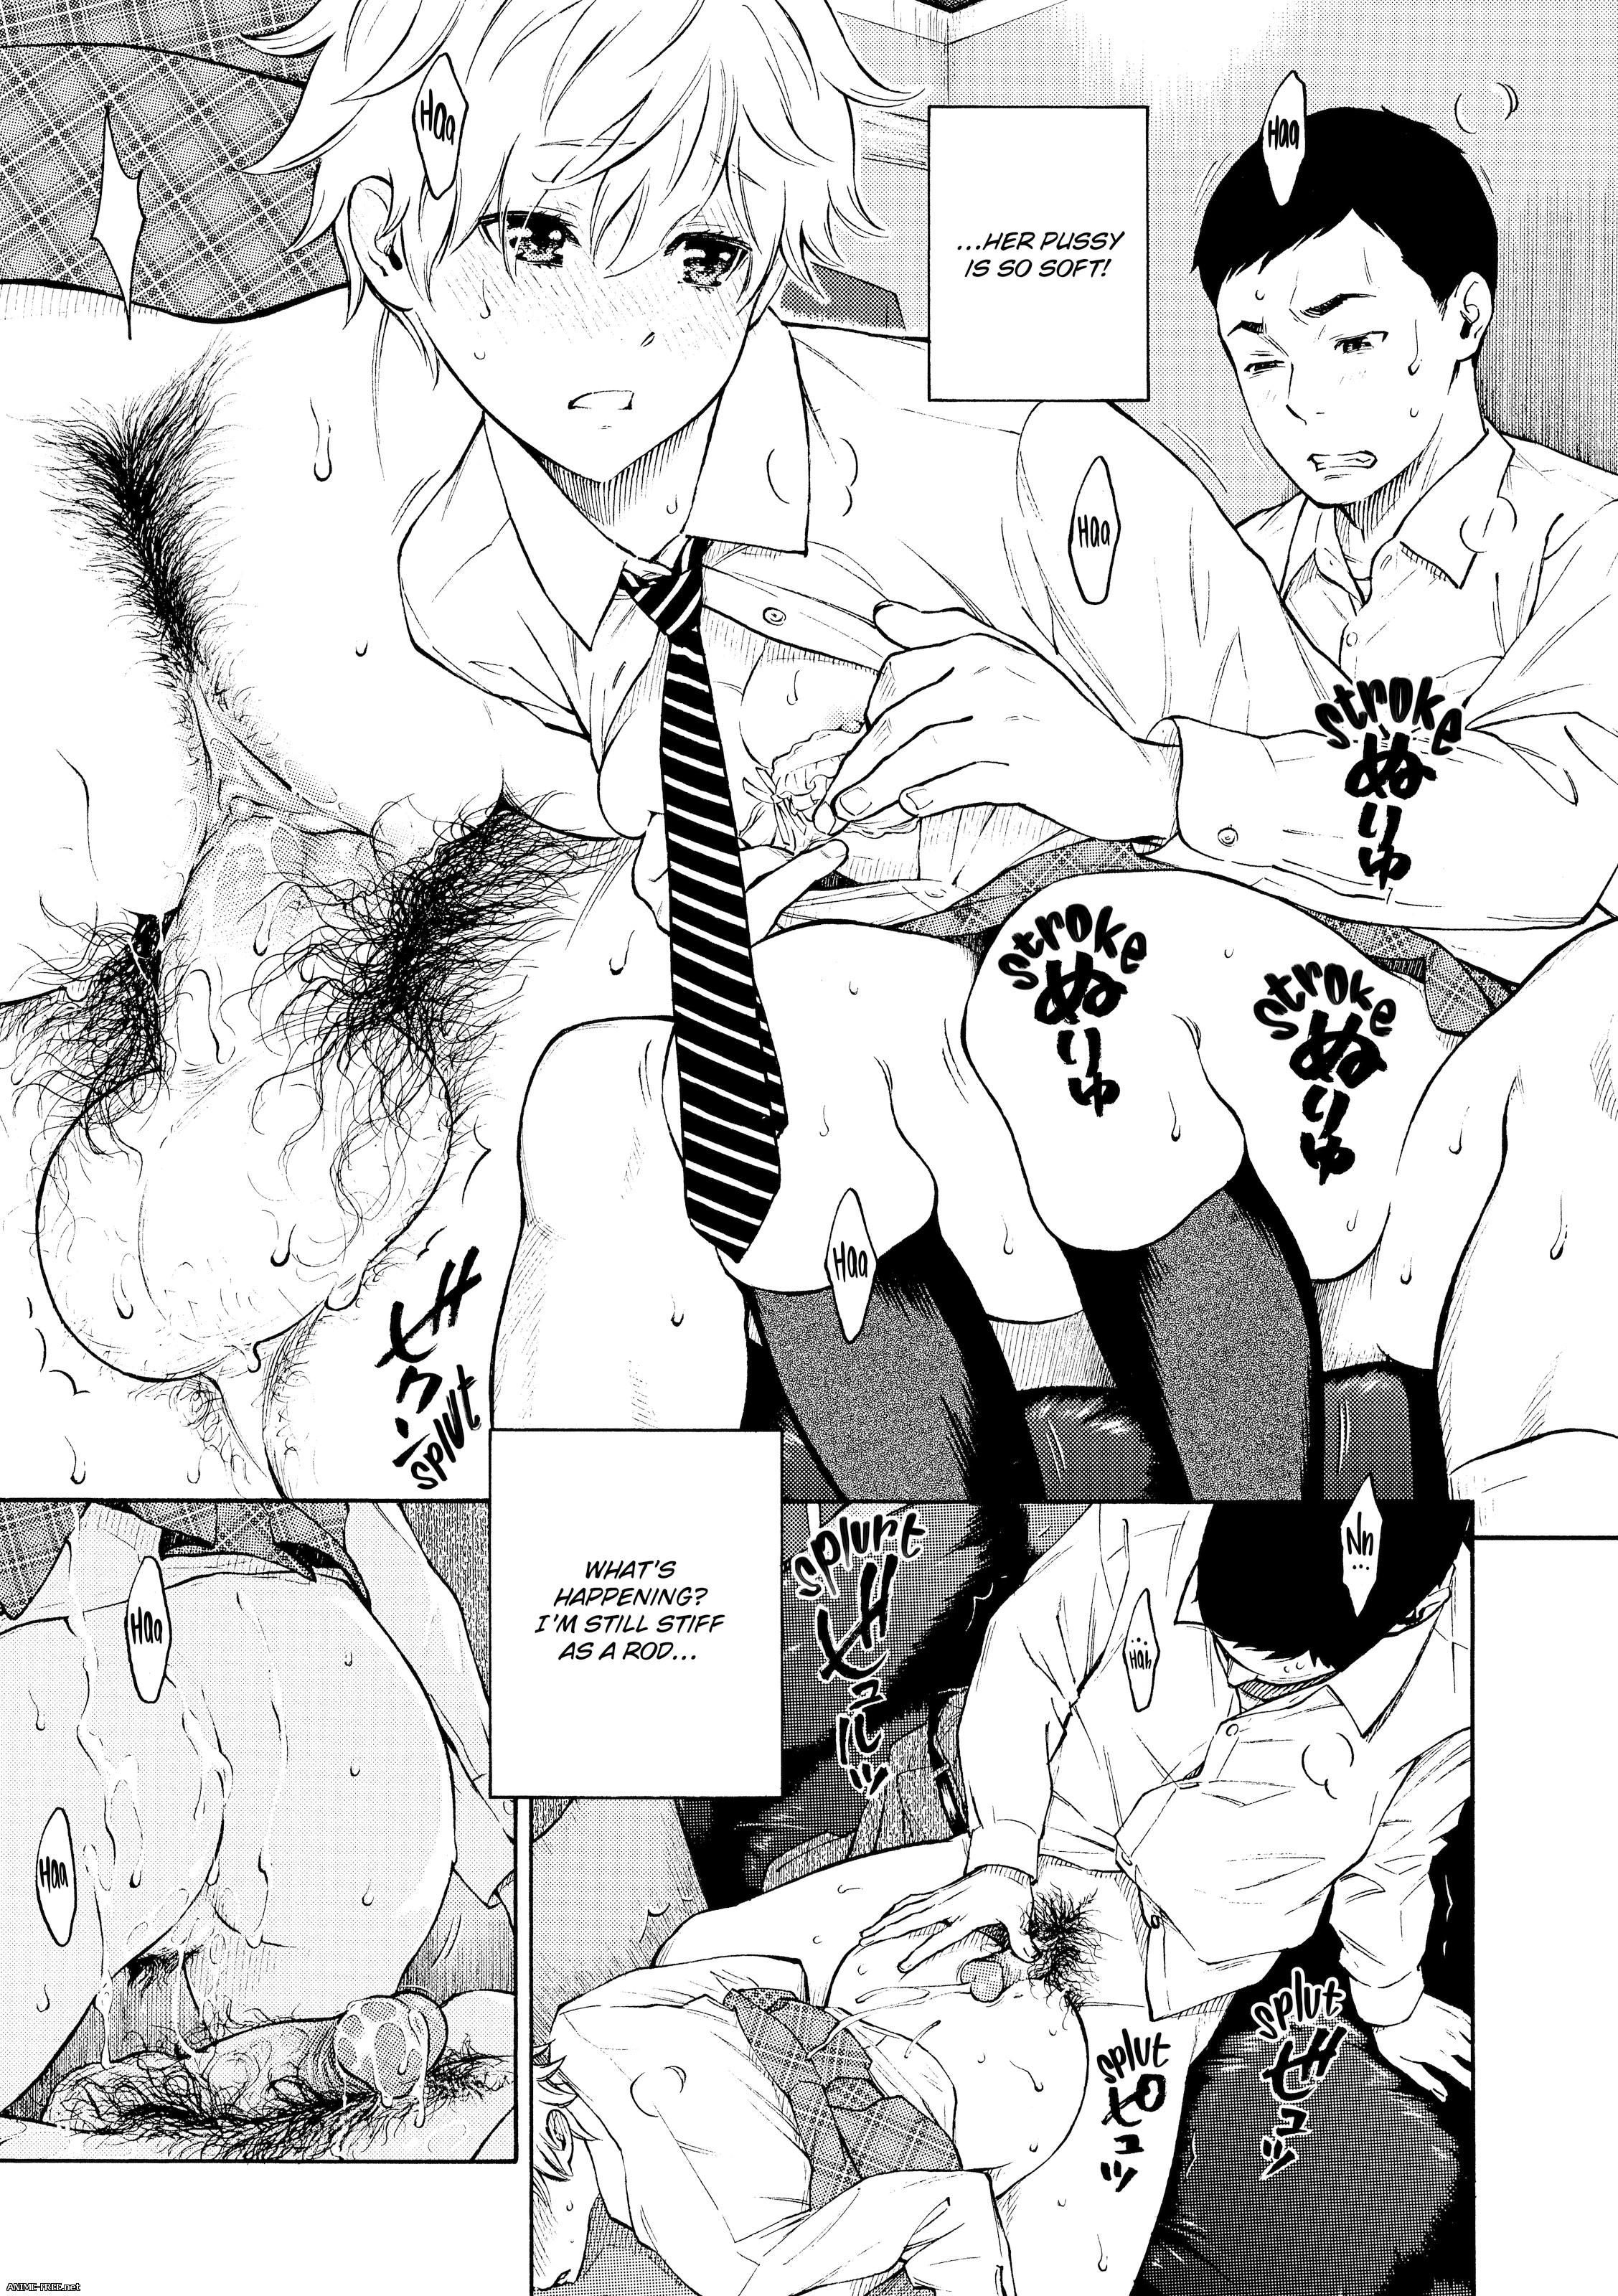 Key - Сборник хентай манги [Ptcen] [RUS,ENG,JAP] Manga Hentai